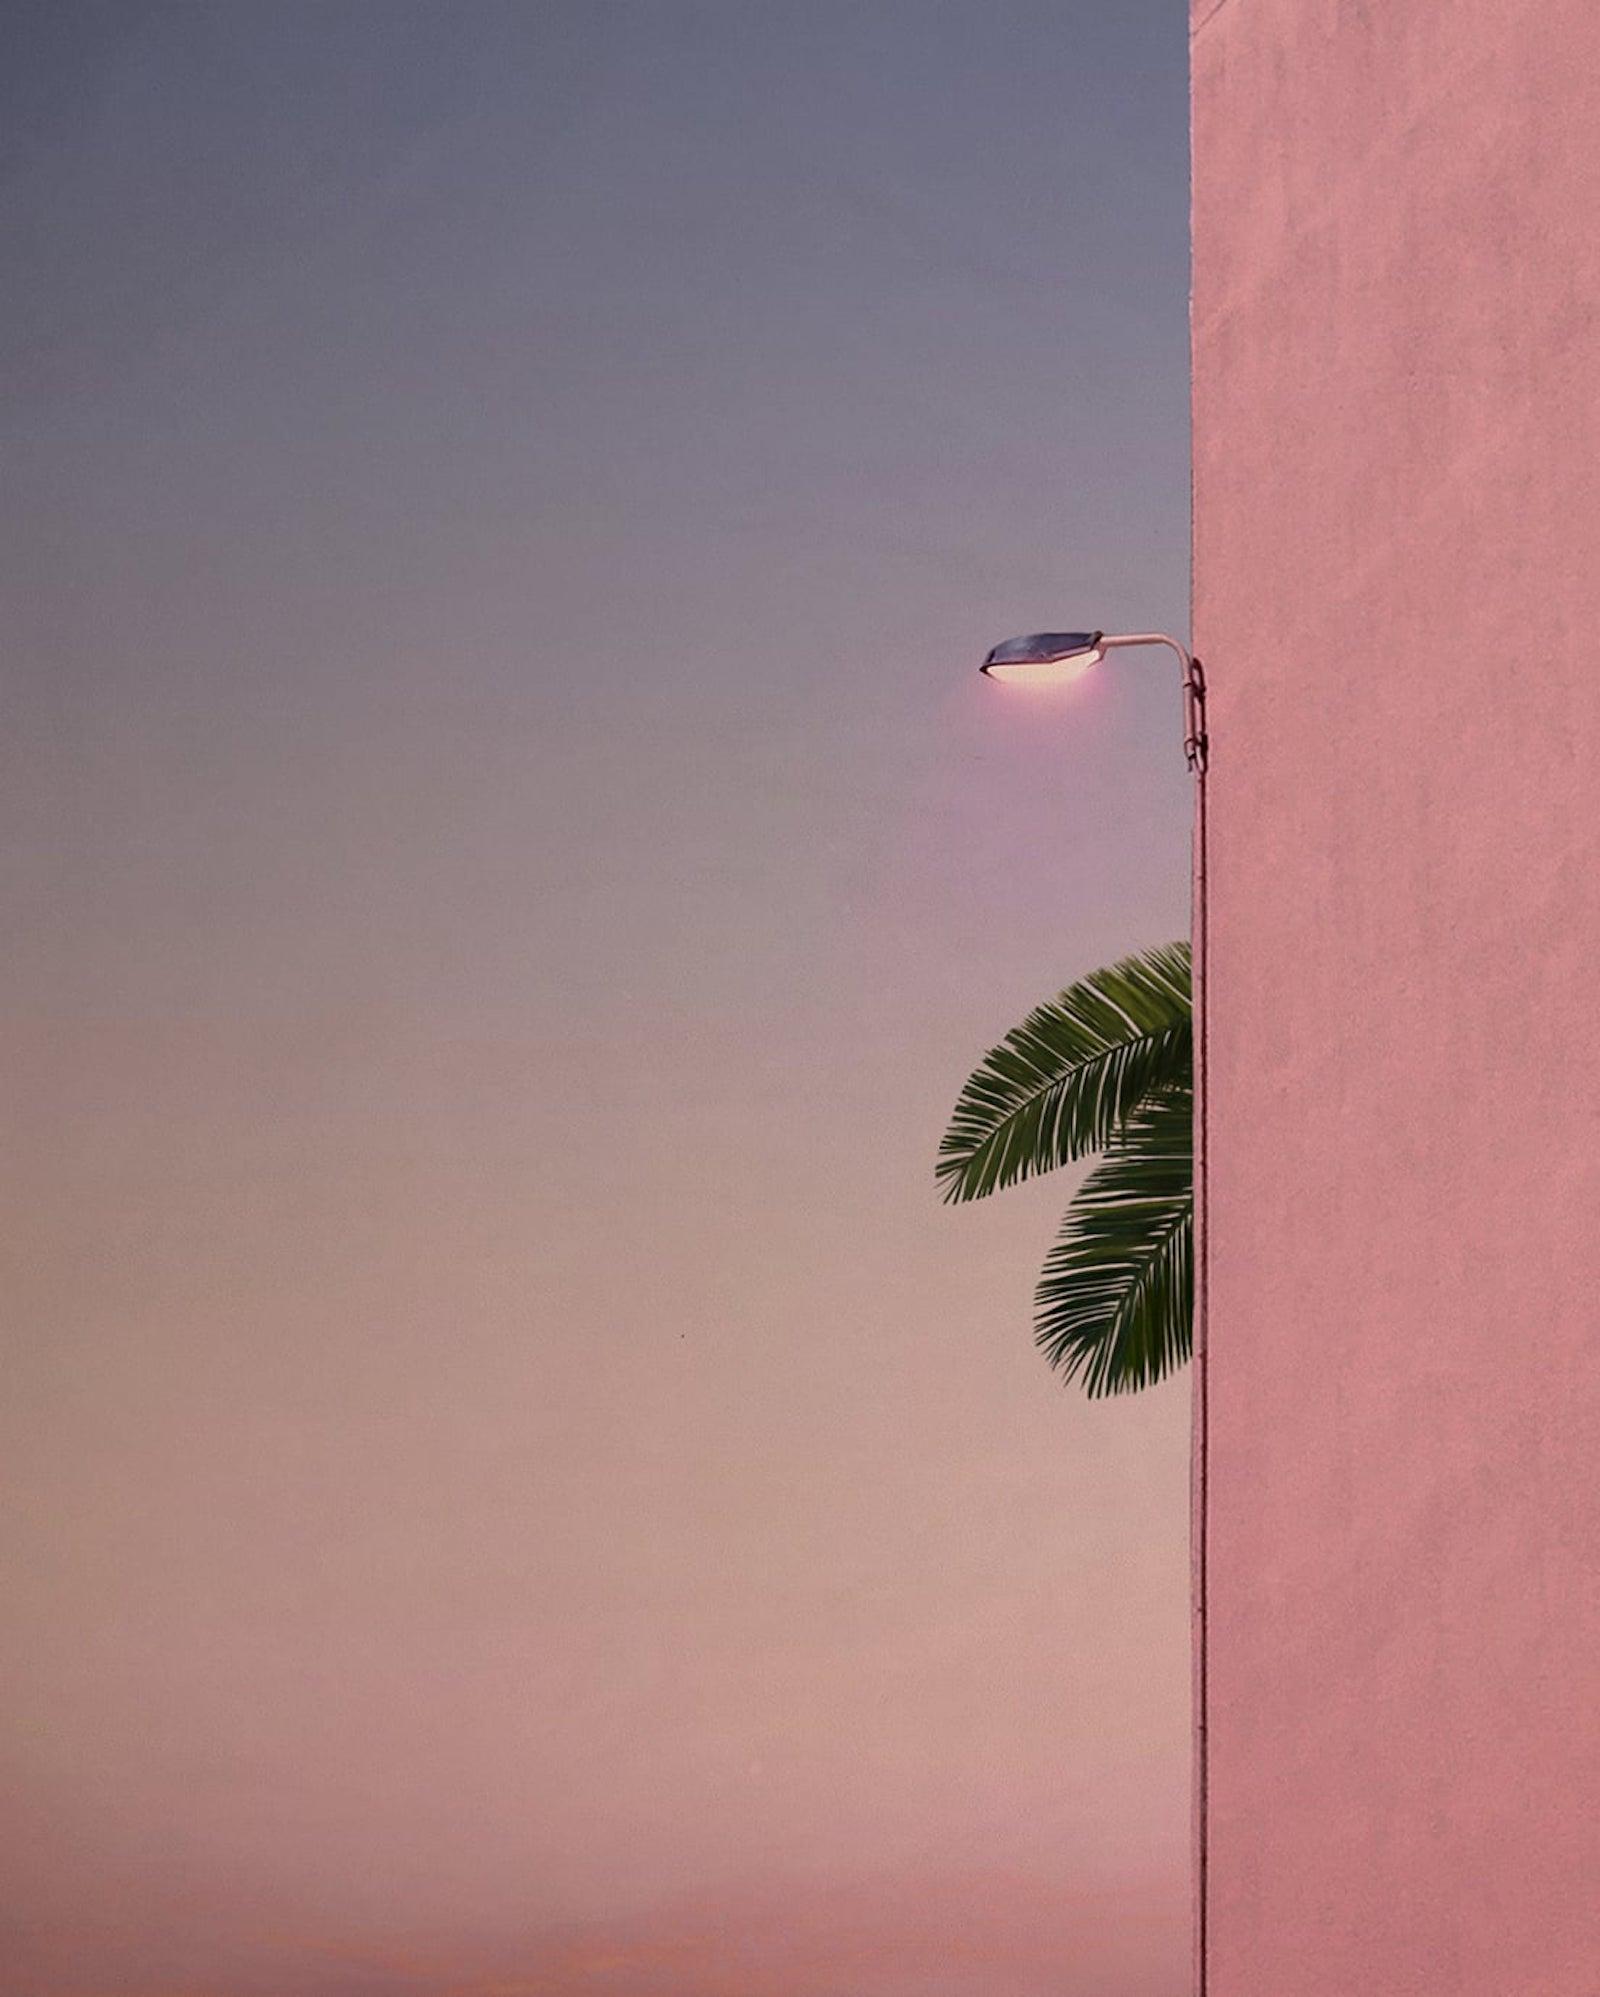 iGNANT-Photography-Andria-Darius-Pancrazi-003